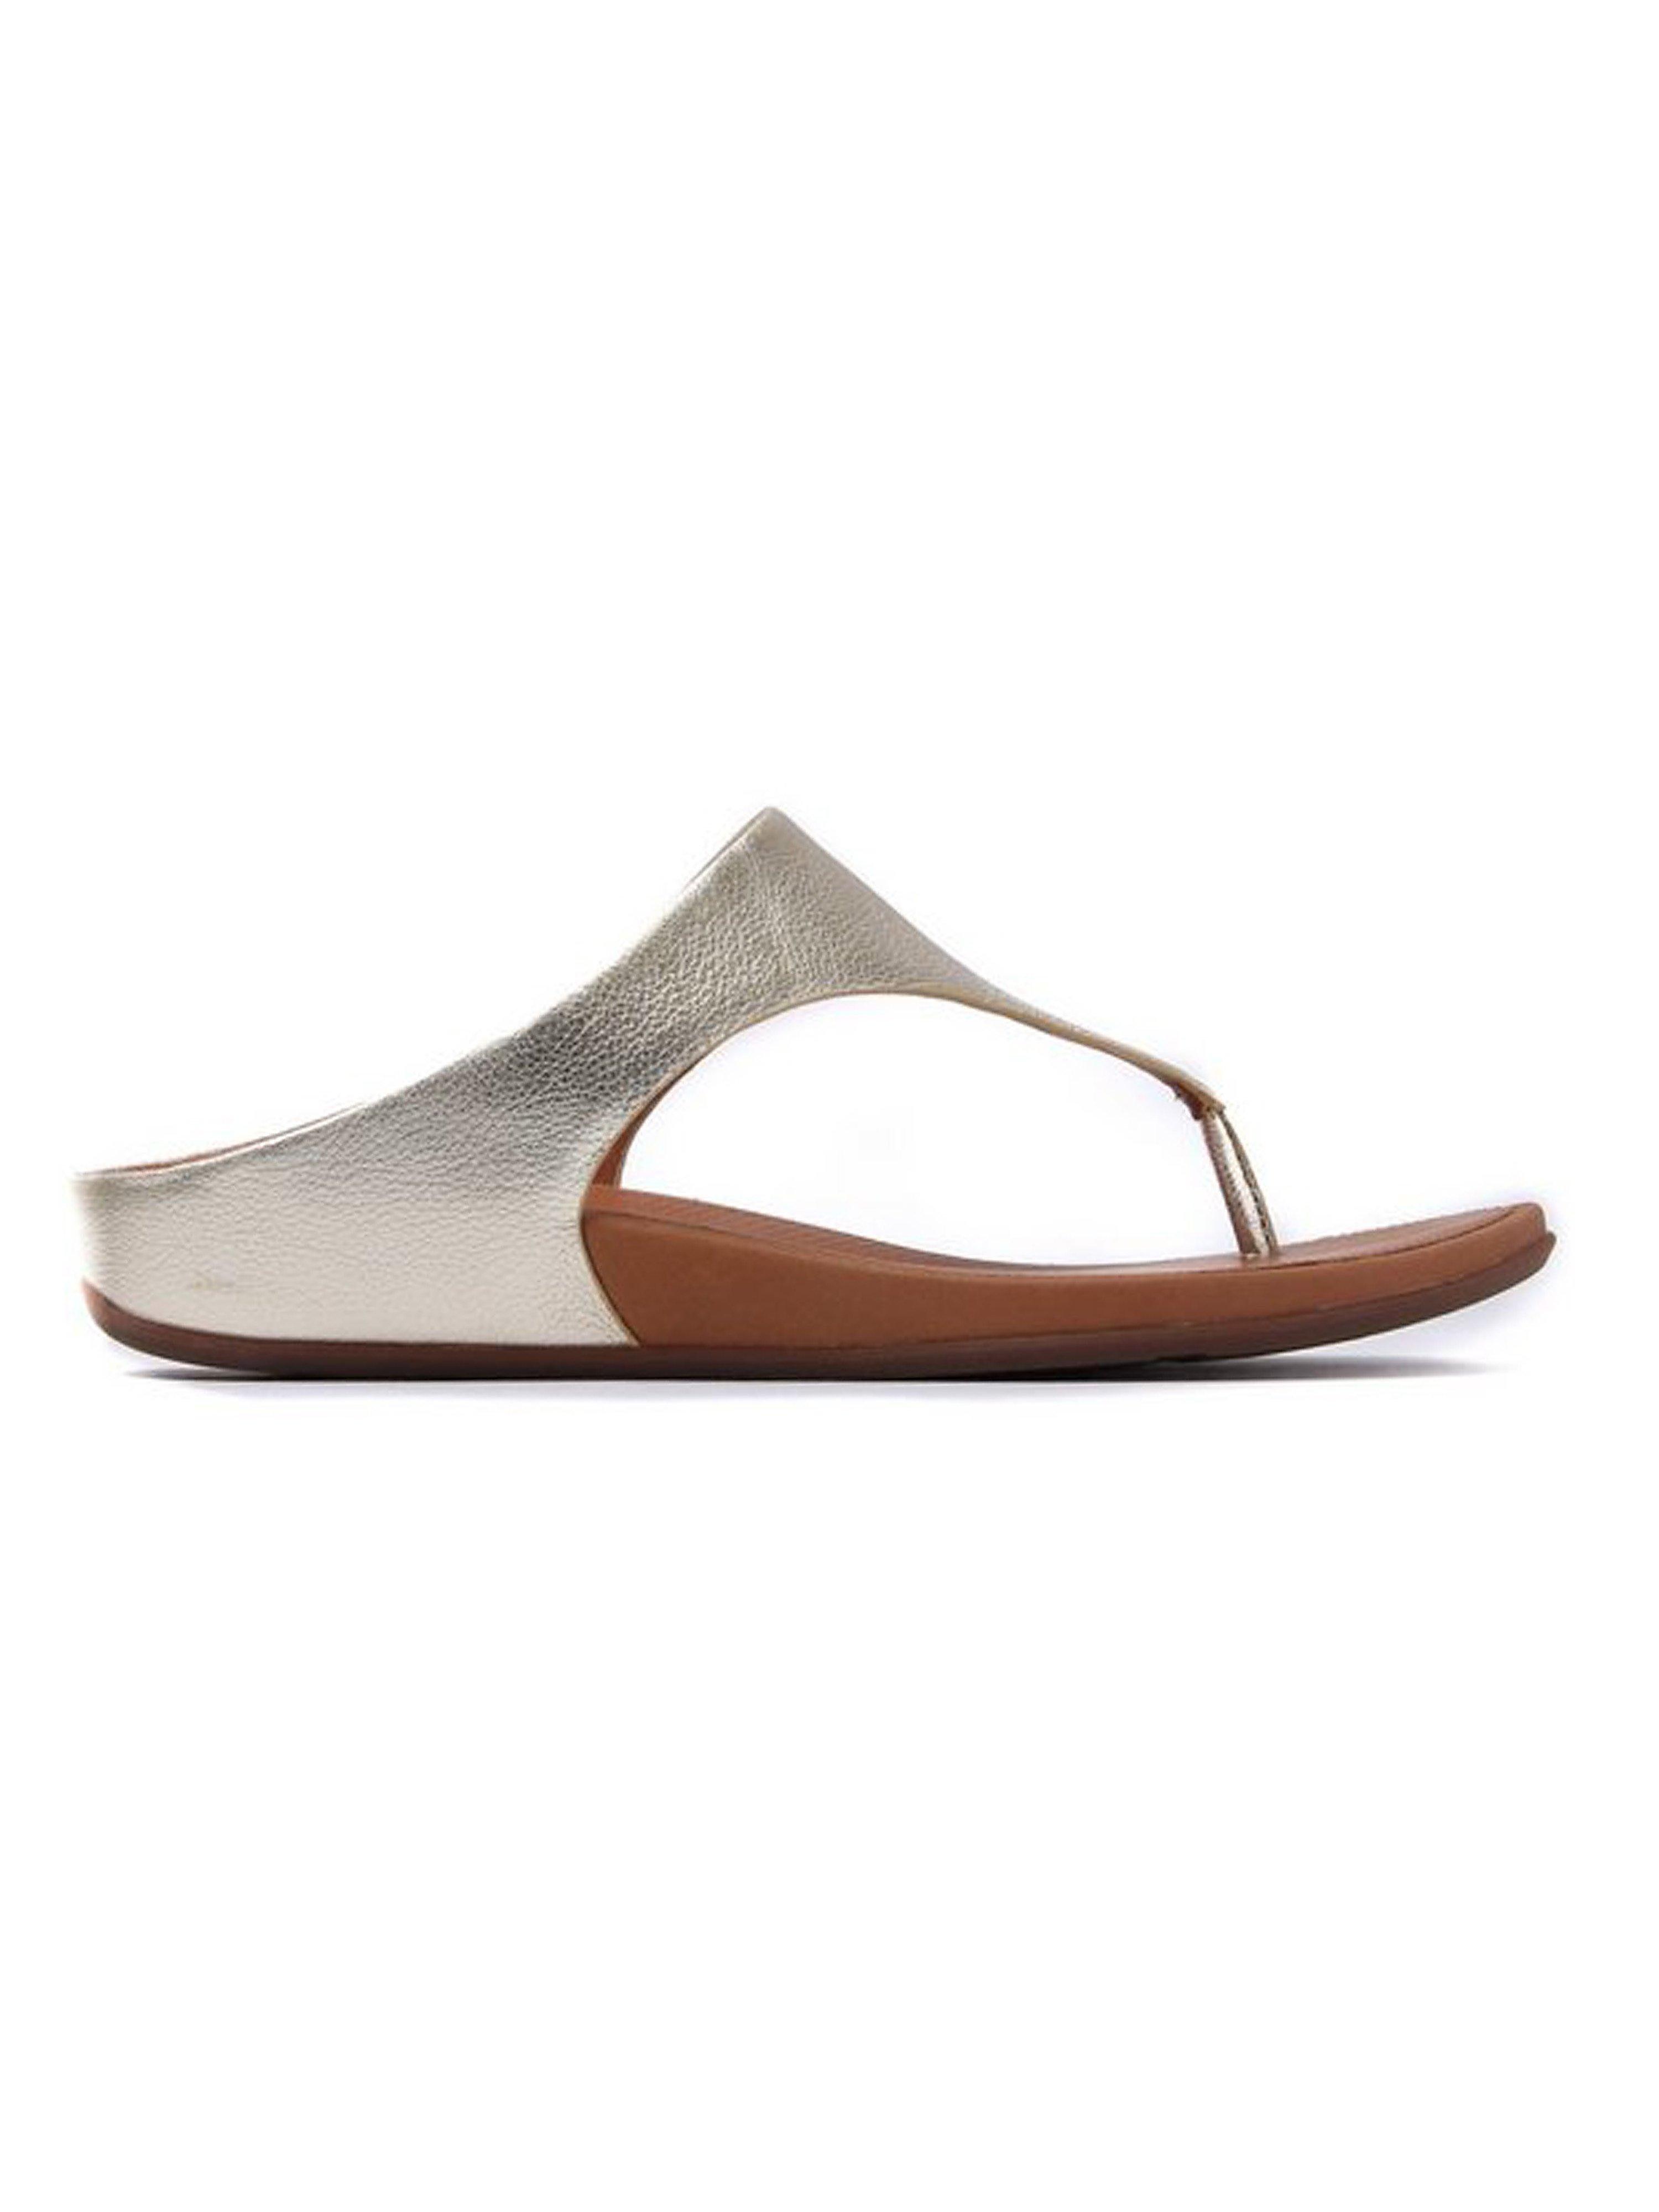 FitFlop Women's Banda Metallic Leather Toe-Post Sandals - Pale Gold